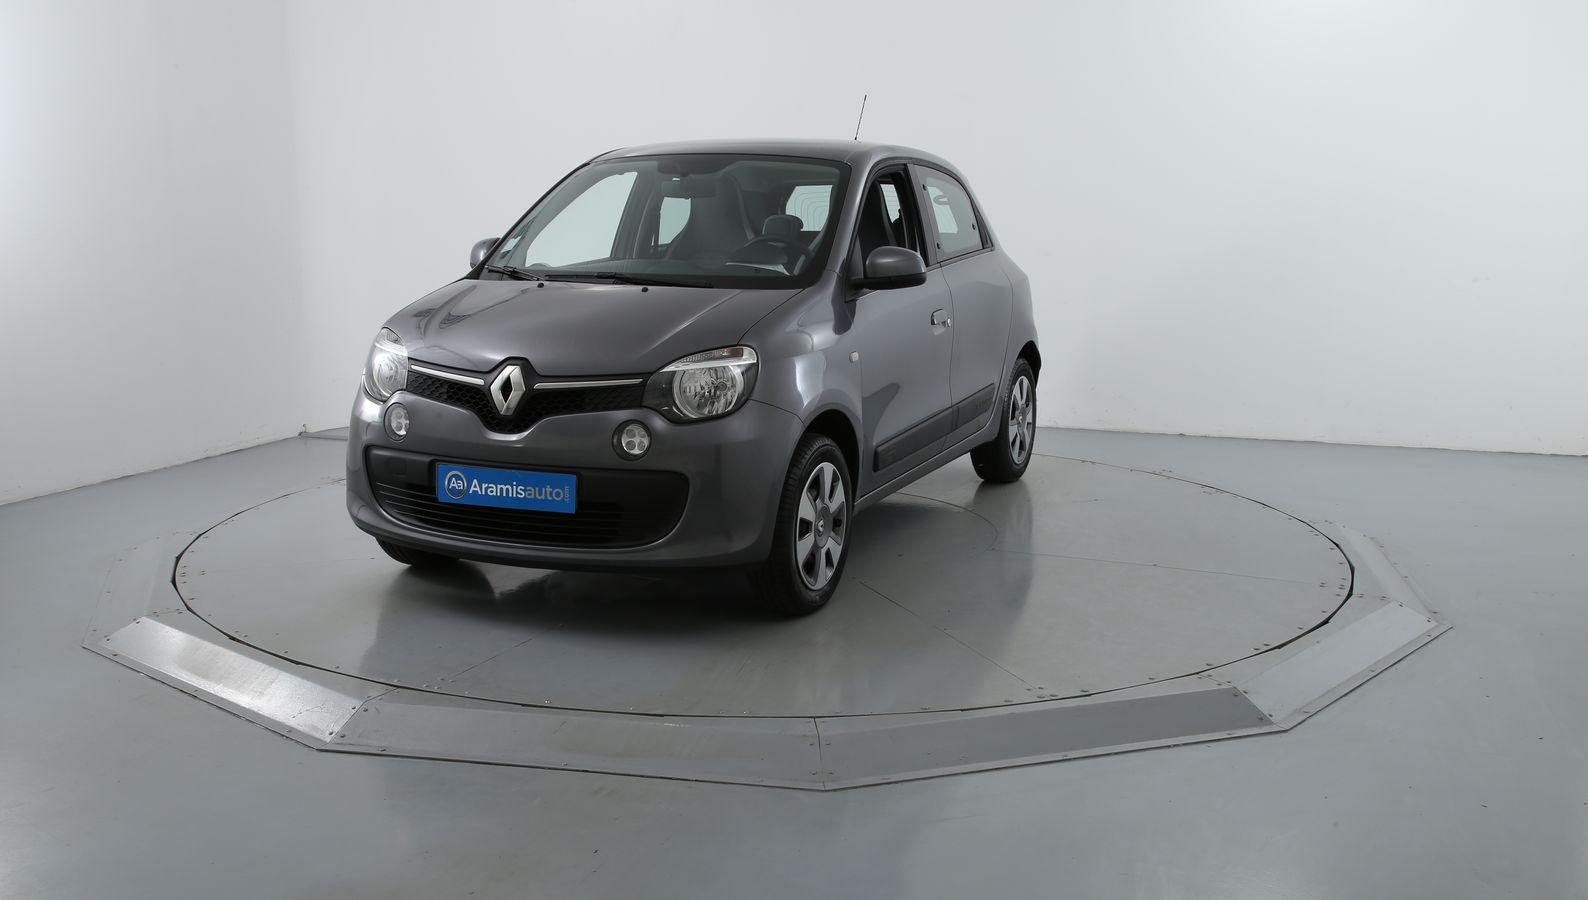 Renault Twingo Citadine Portes Essence SCe BVM - Citadine 5 portes